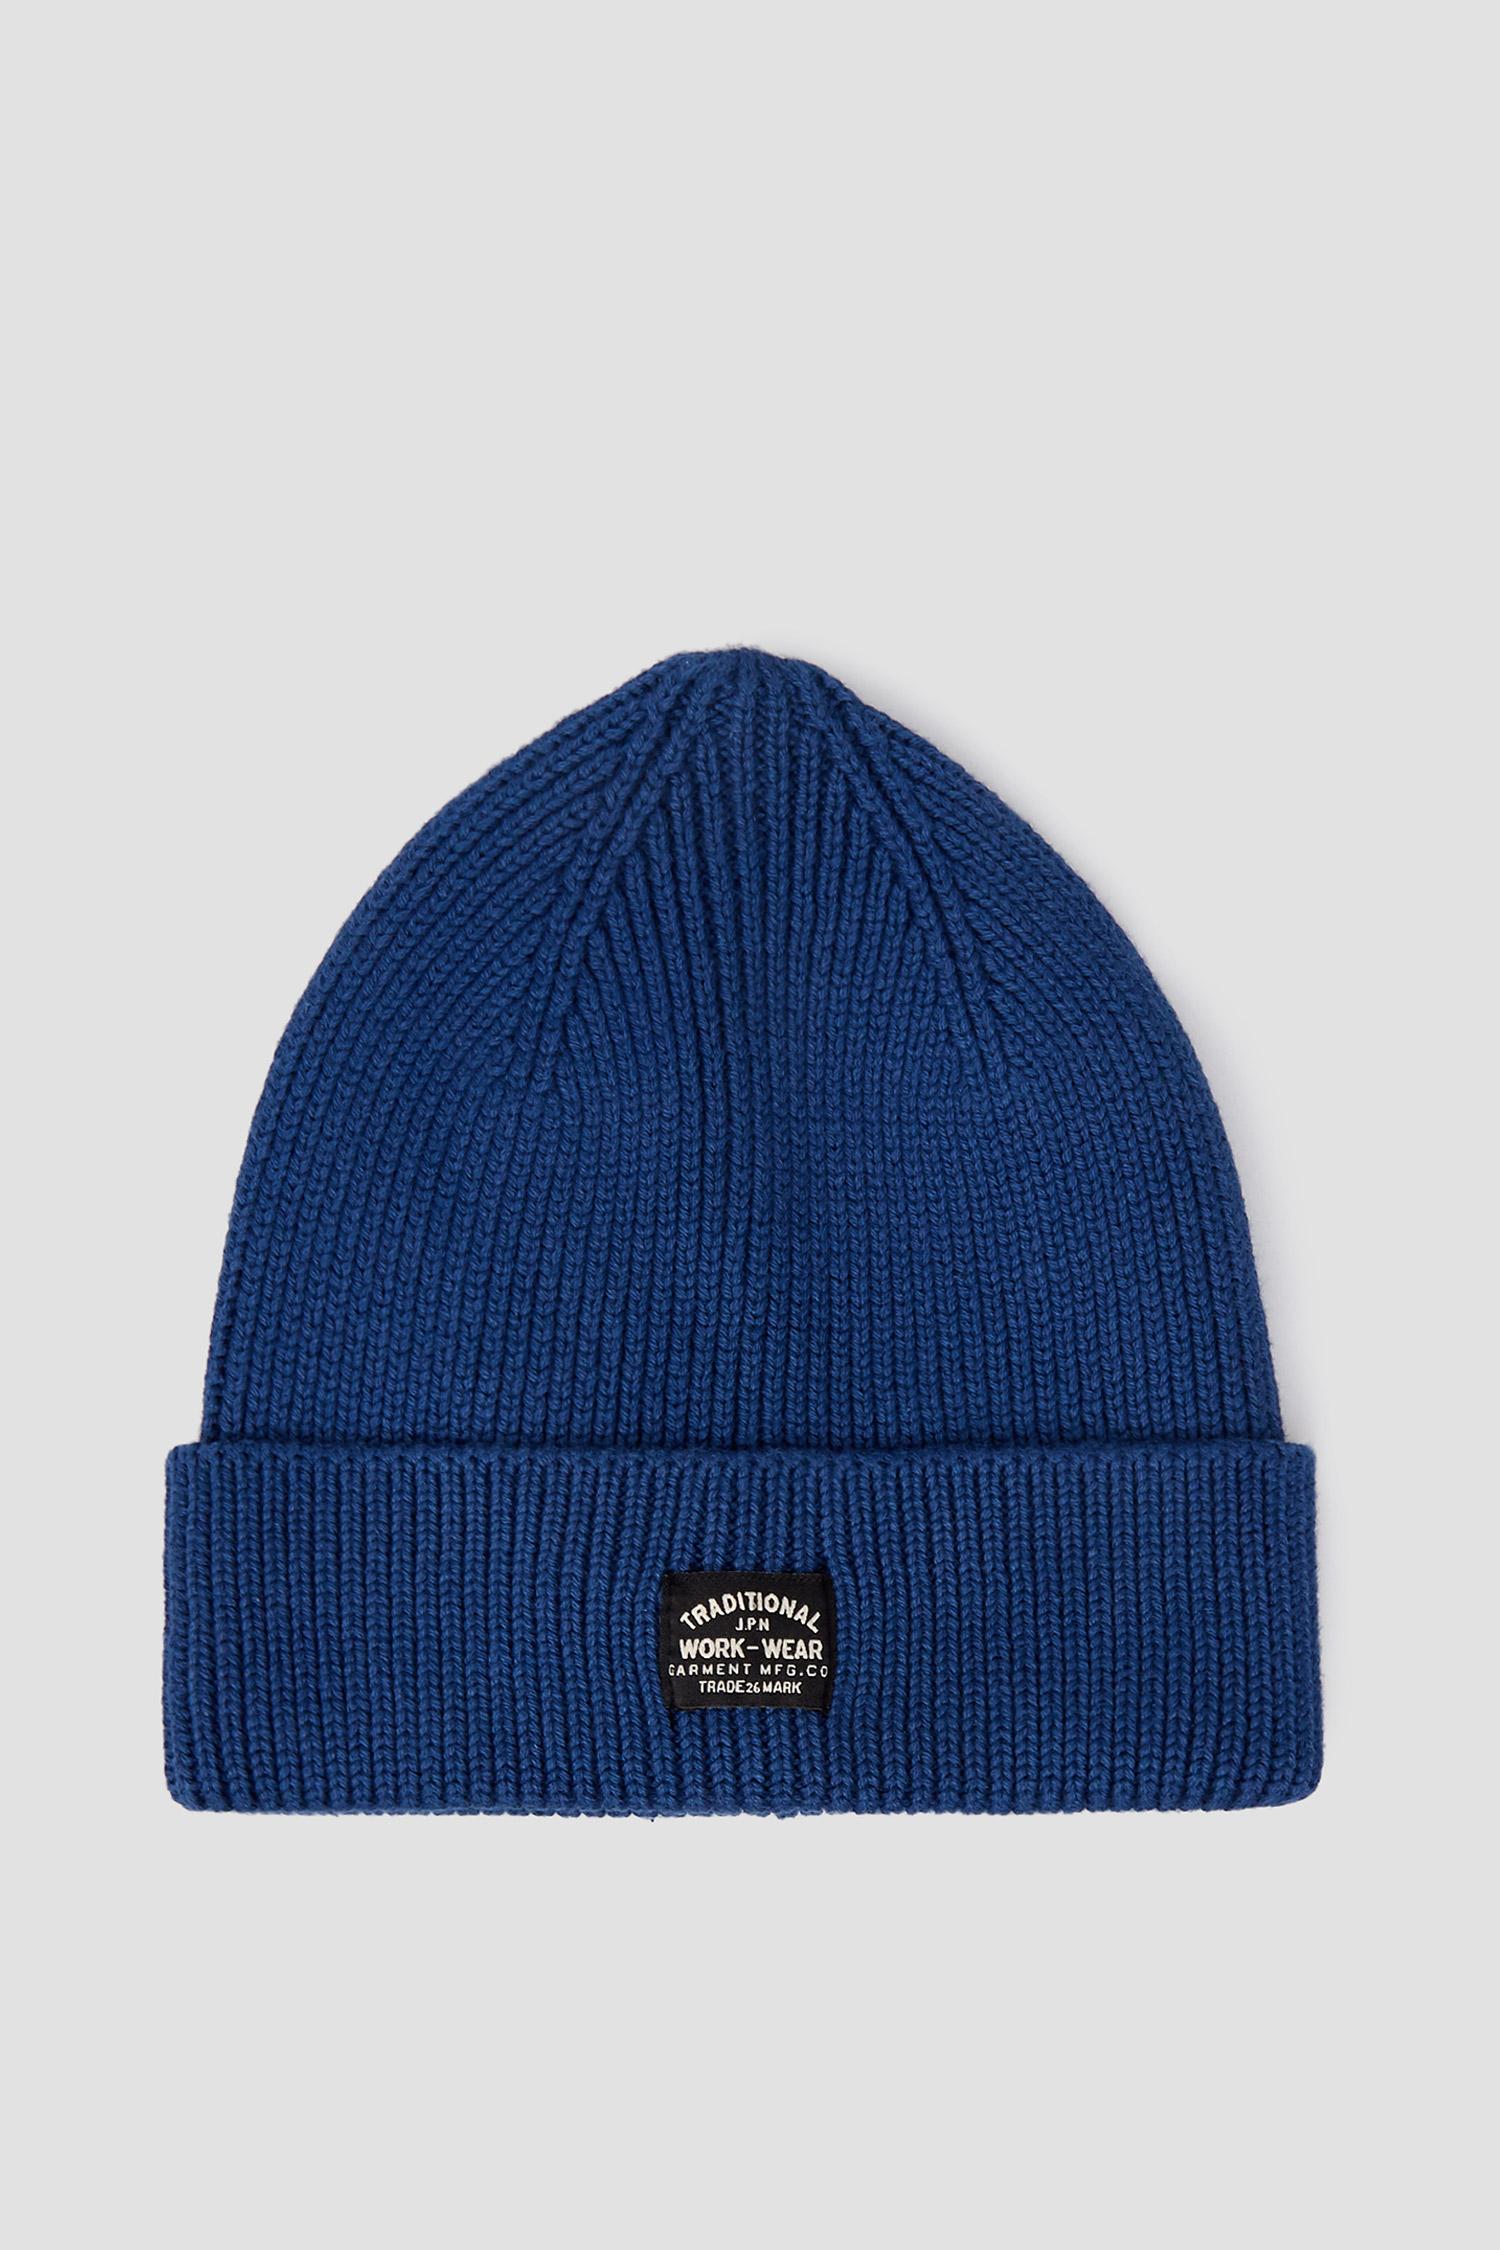 Мужская синяя шапка SuperDry M9010036A;J6P